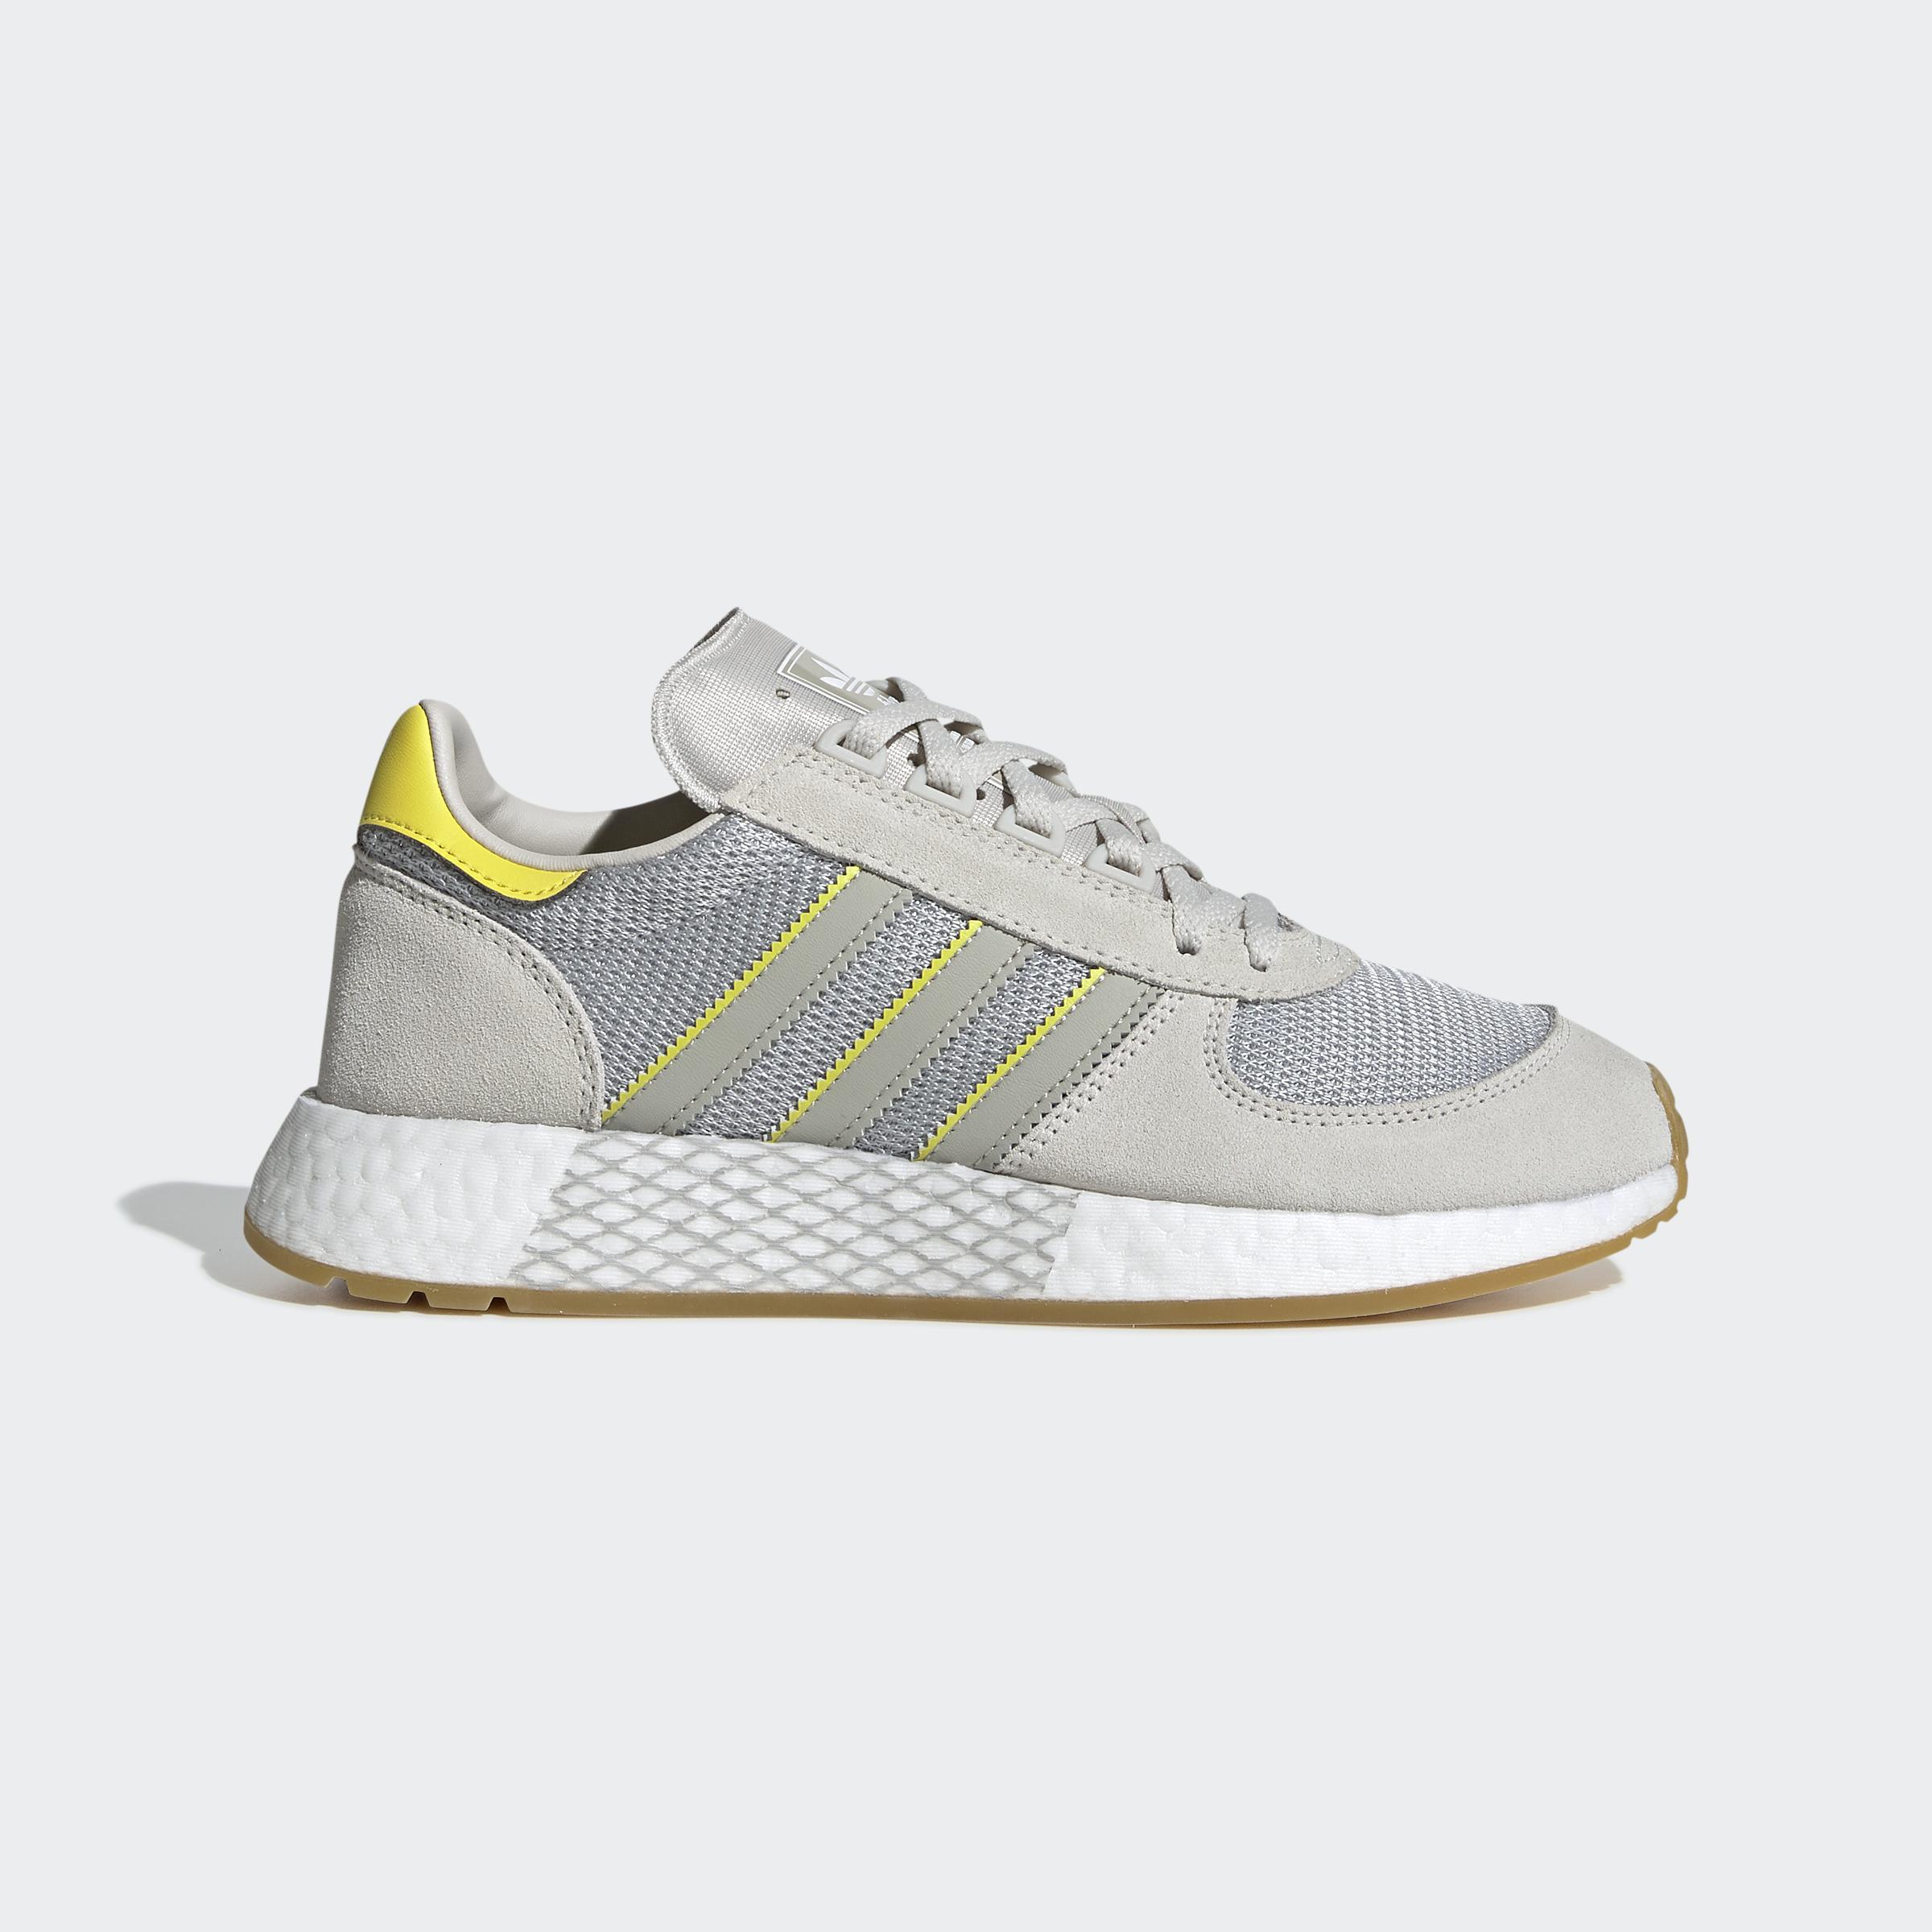 adidas-Marathon-Tech-Shoes-Women-039-s-Athletic-amp-Sneakers thumbnail 14